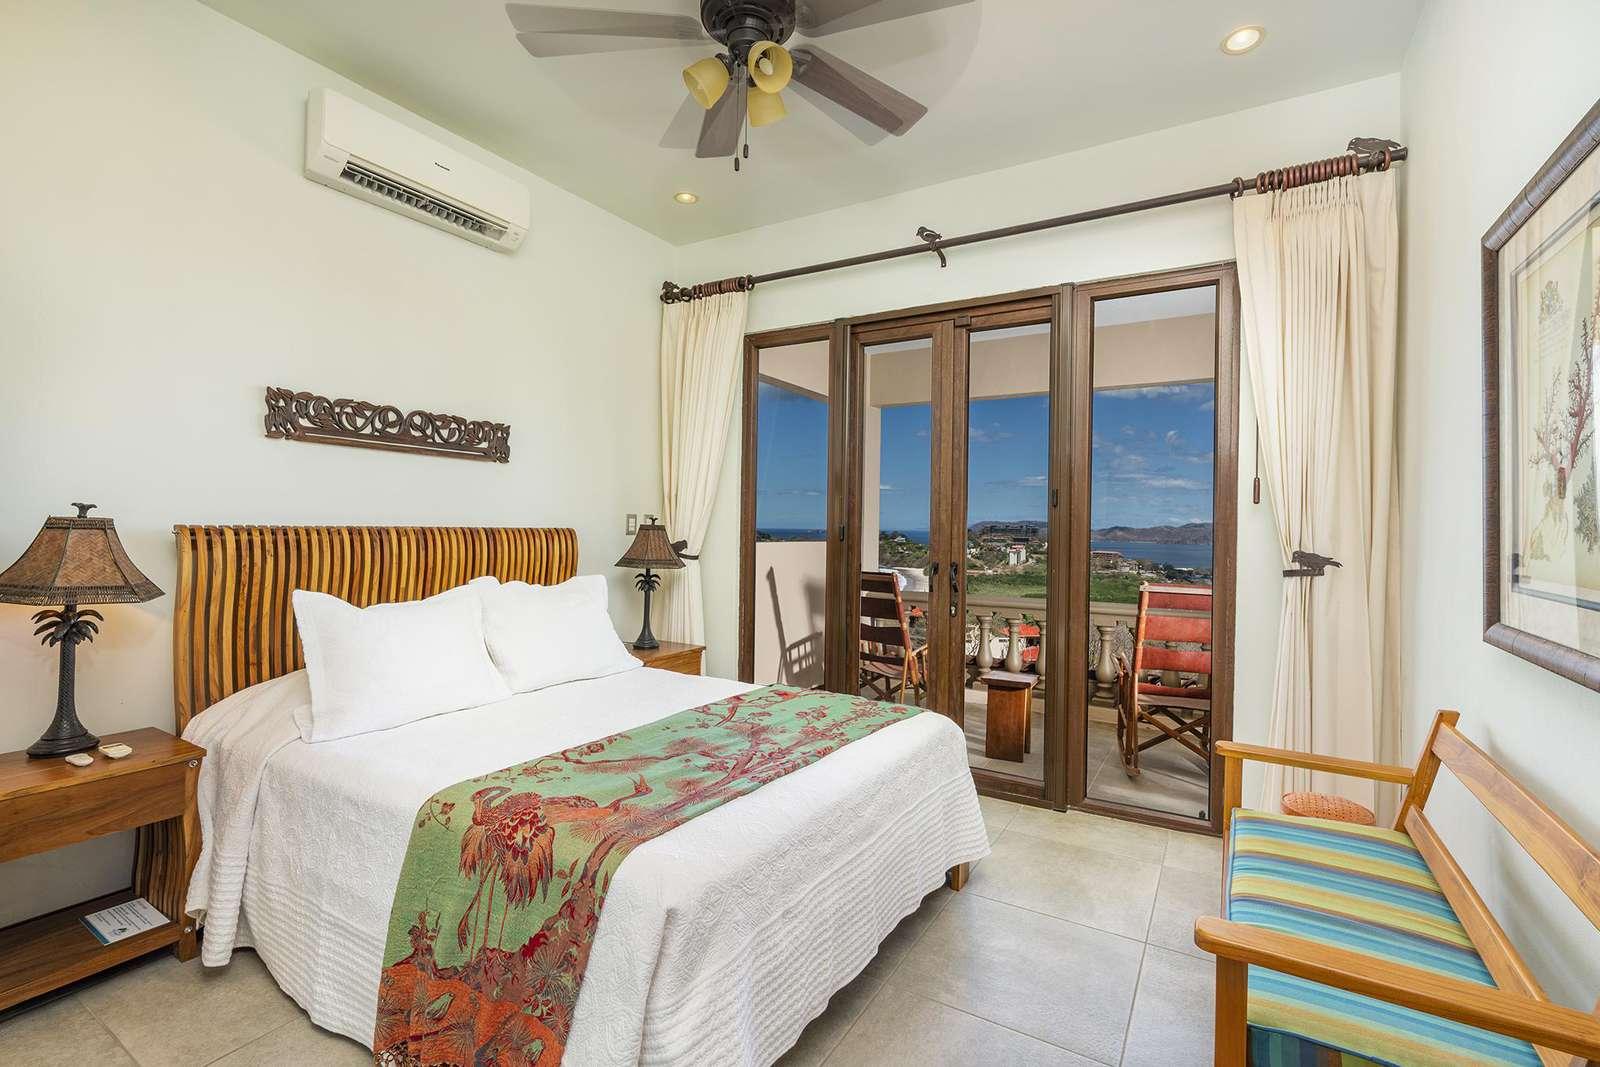 Guest bedroom, Queen bed, private bathroom, private terrace, ocean views